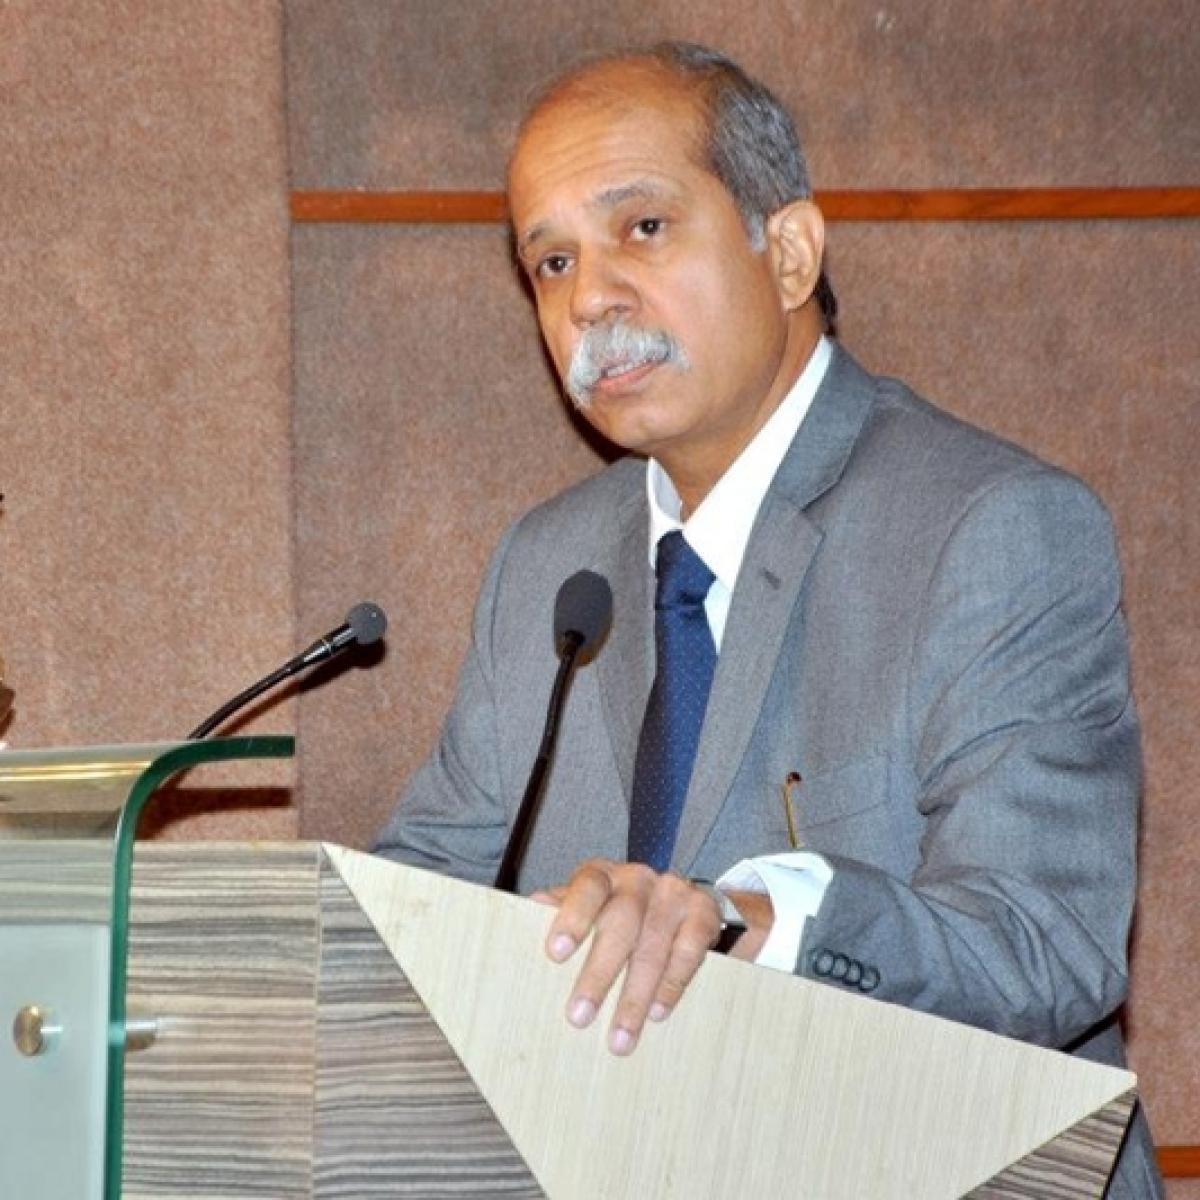 Collegium has taken decision on Justice Akil Kureshi's elevation SC